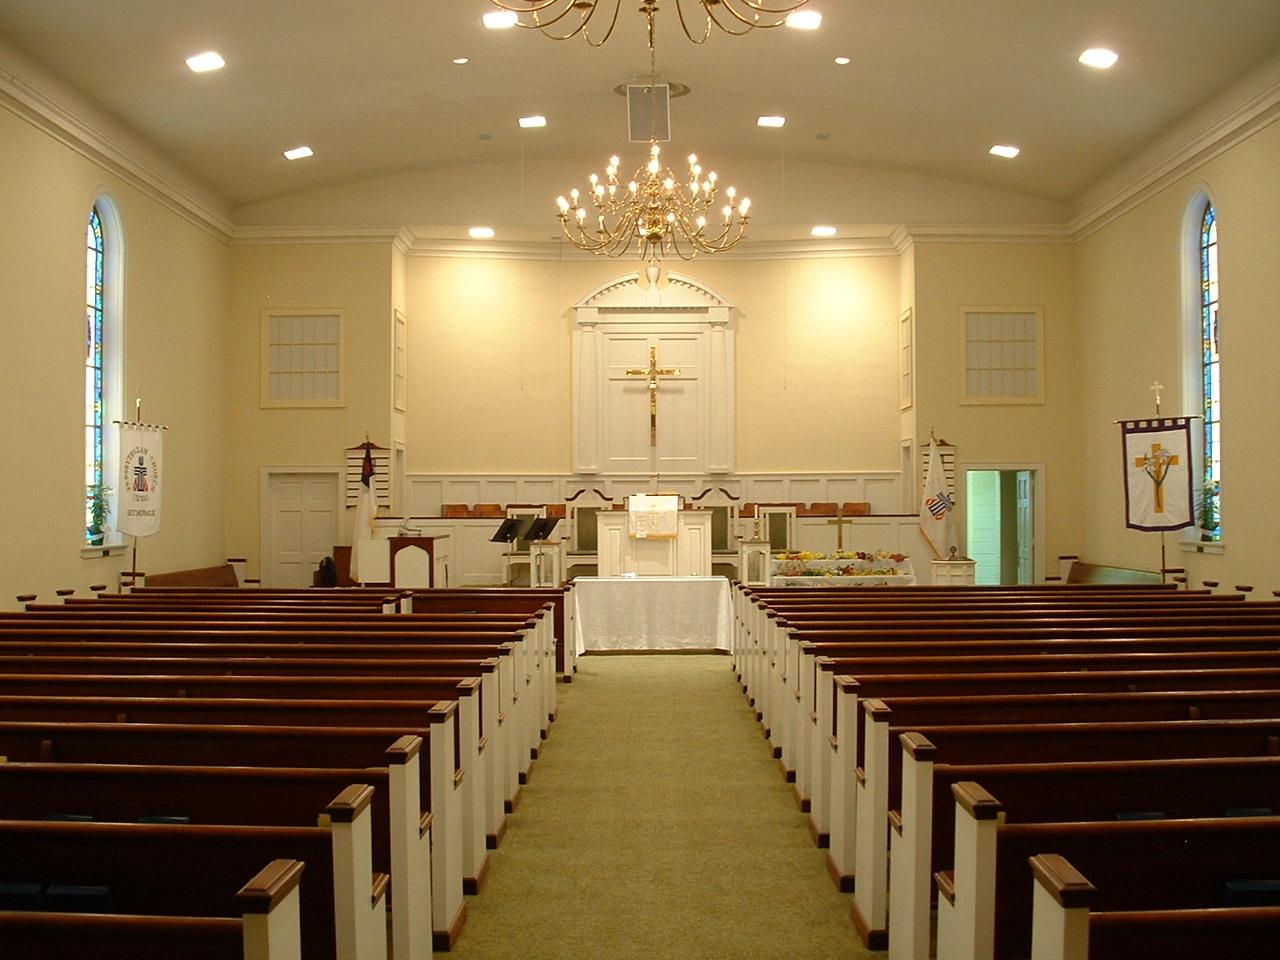 Church Sanctuary Design Ideas Churches have always been